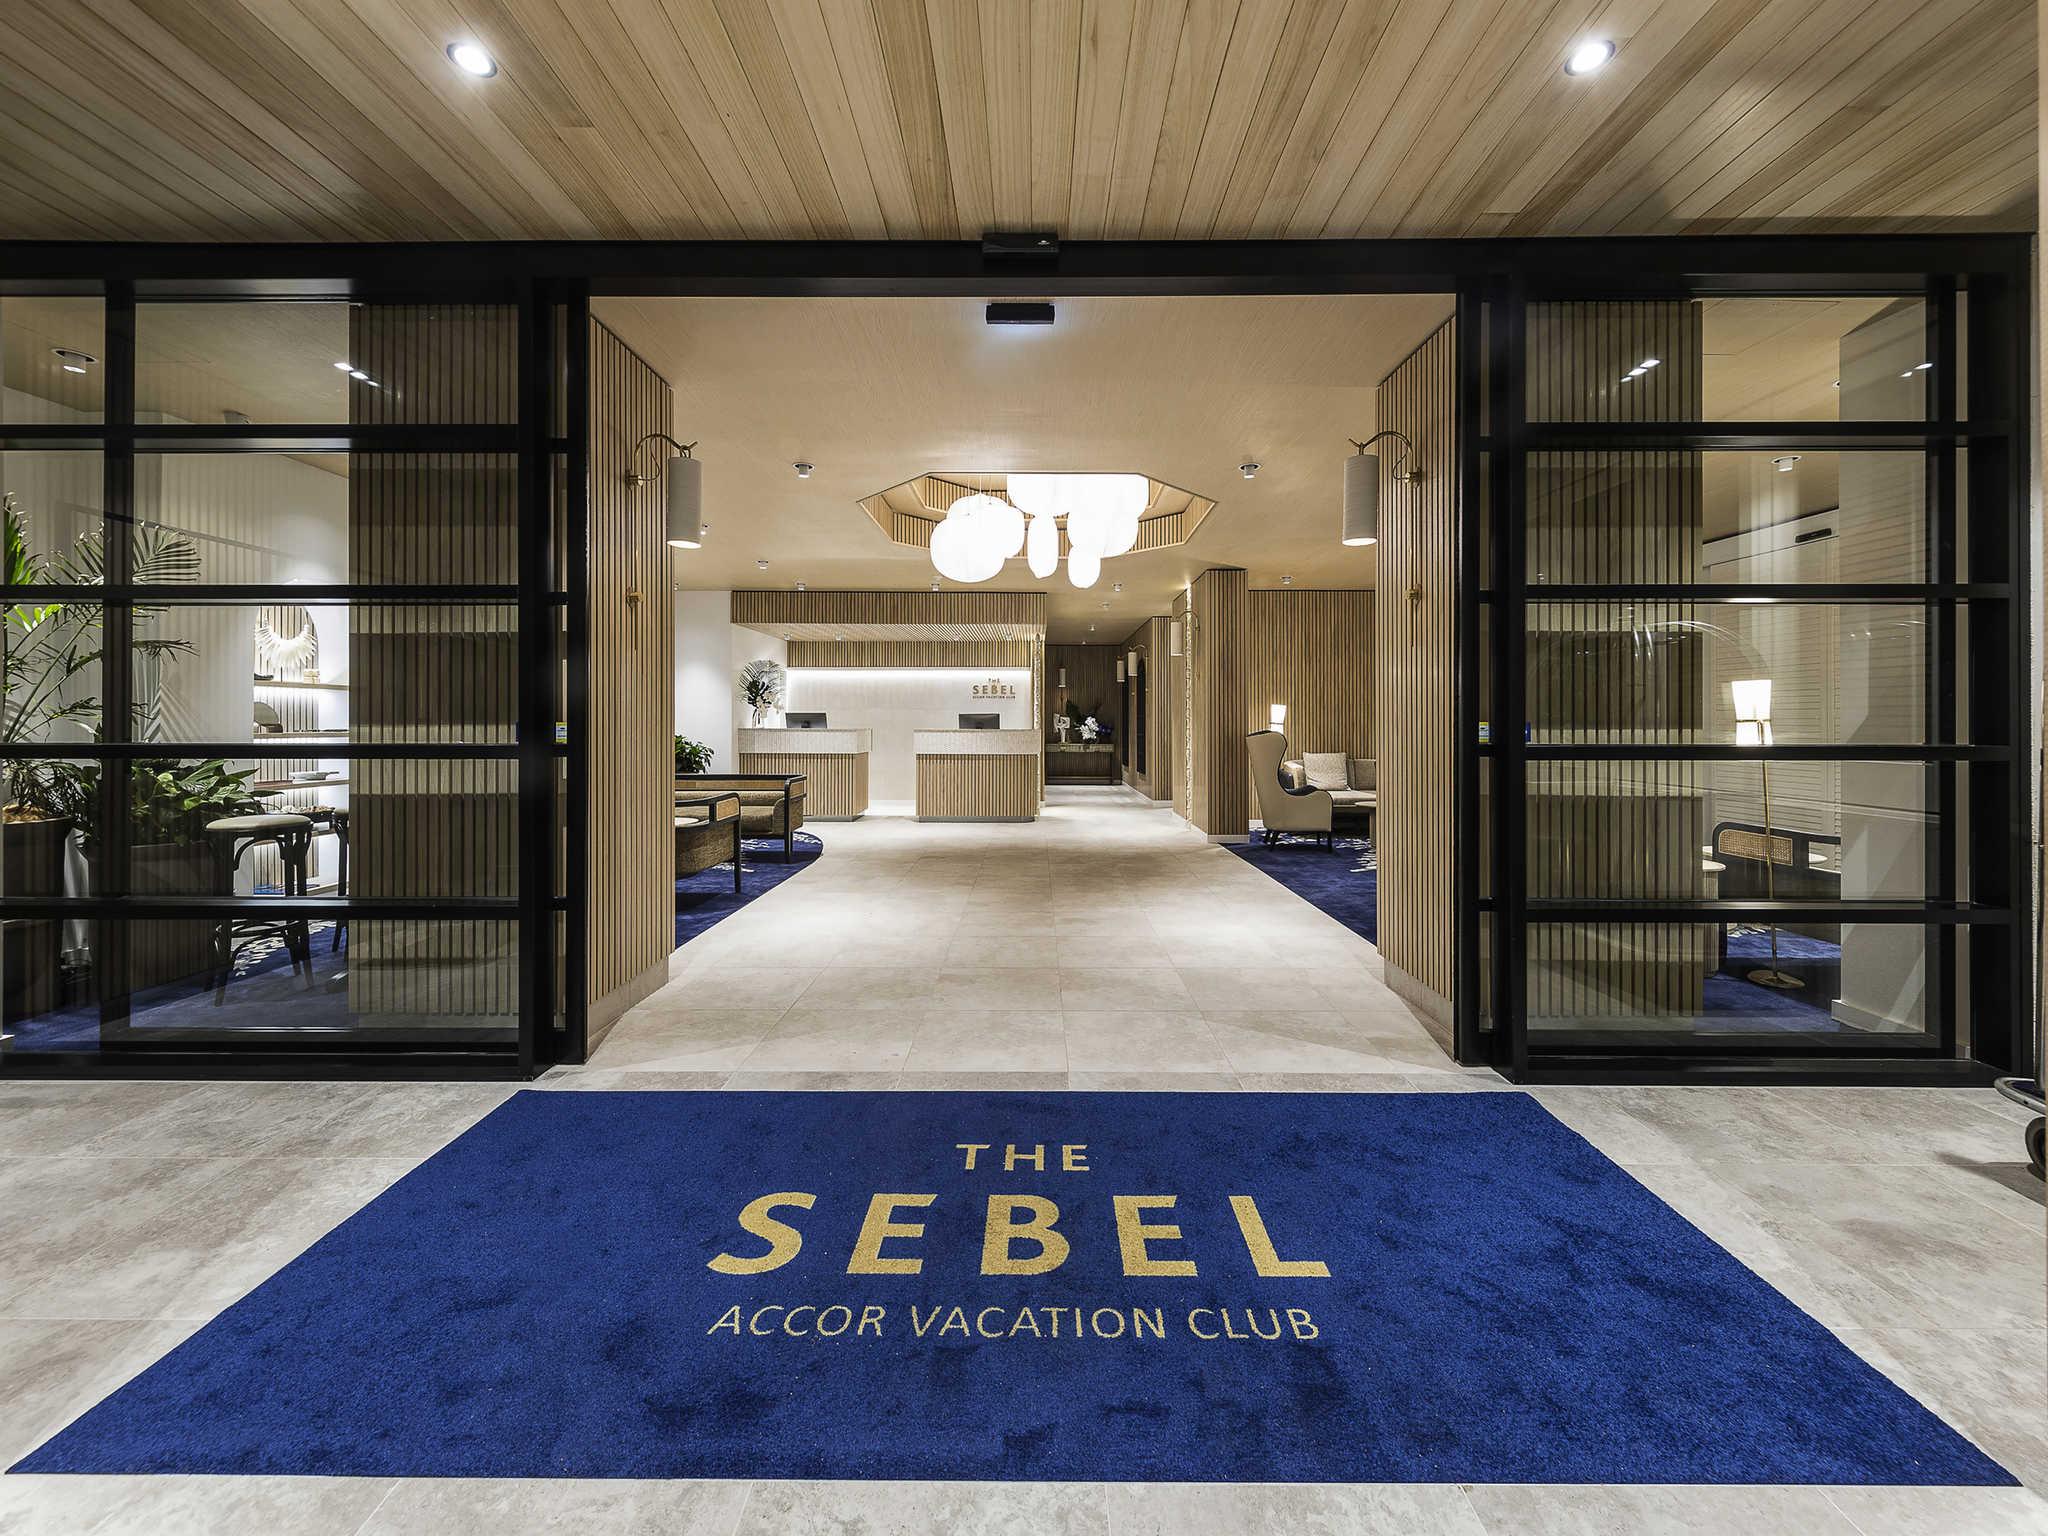 فندق - ذى سيبال The Sebel مانلي بيتش